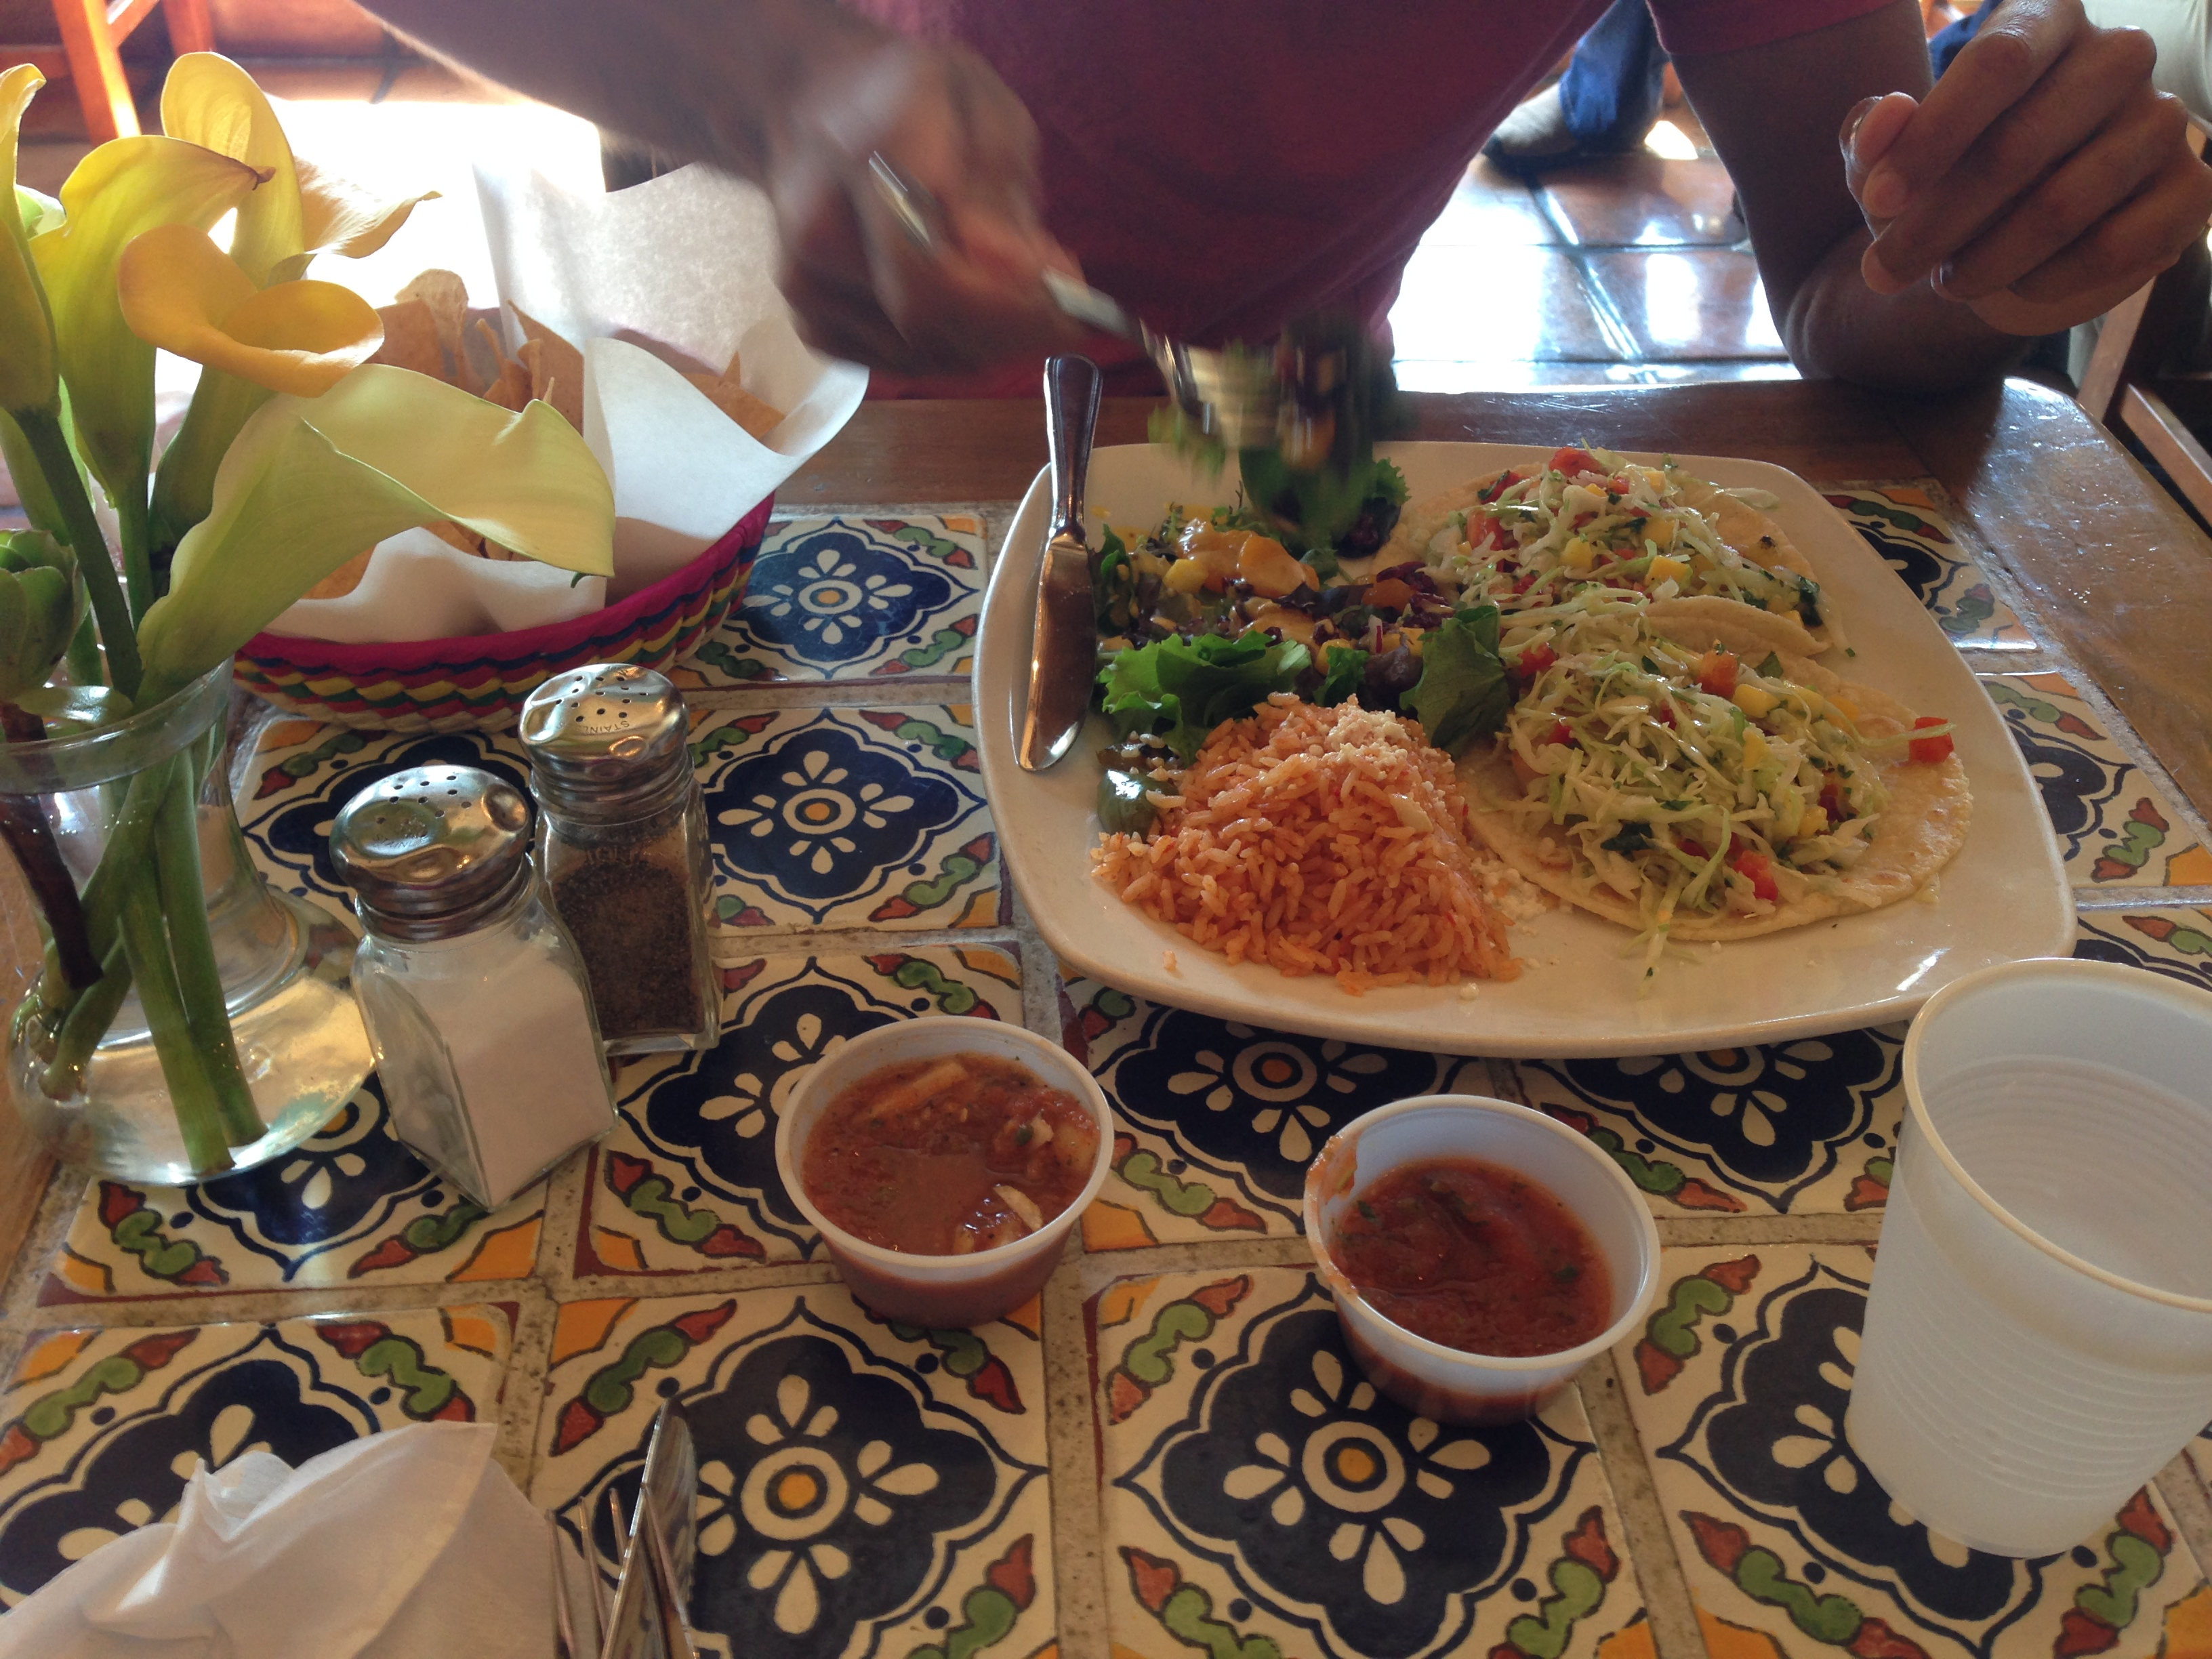 Food pics + travelogue combined! Here we are at Los Agaves, a fabulously reviewed (http://www.yelp.com/biz/los-agaves-santa-barbara) Mexican restaurant in Santa Barbara.